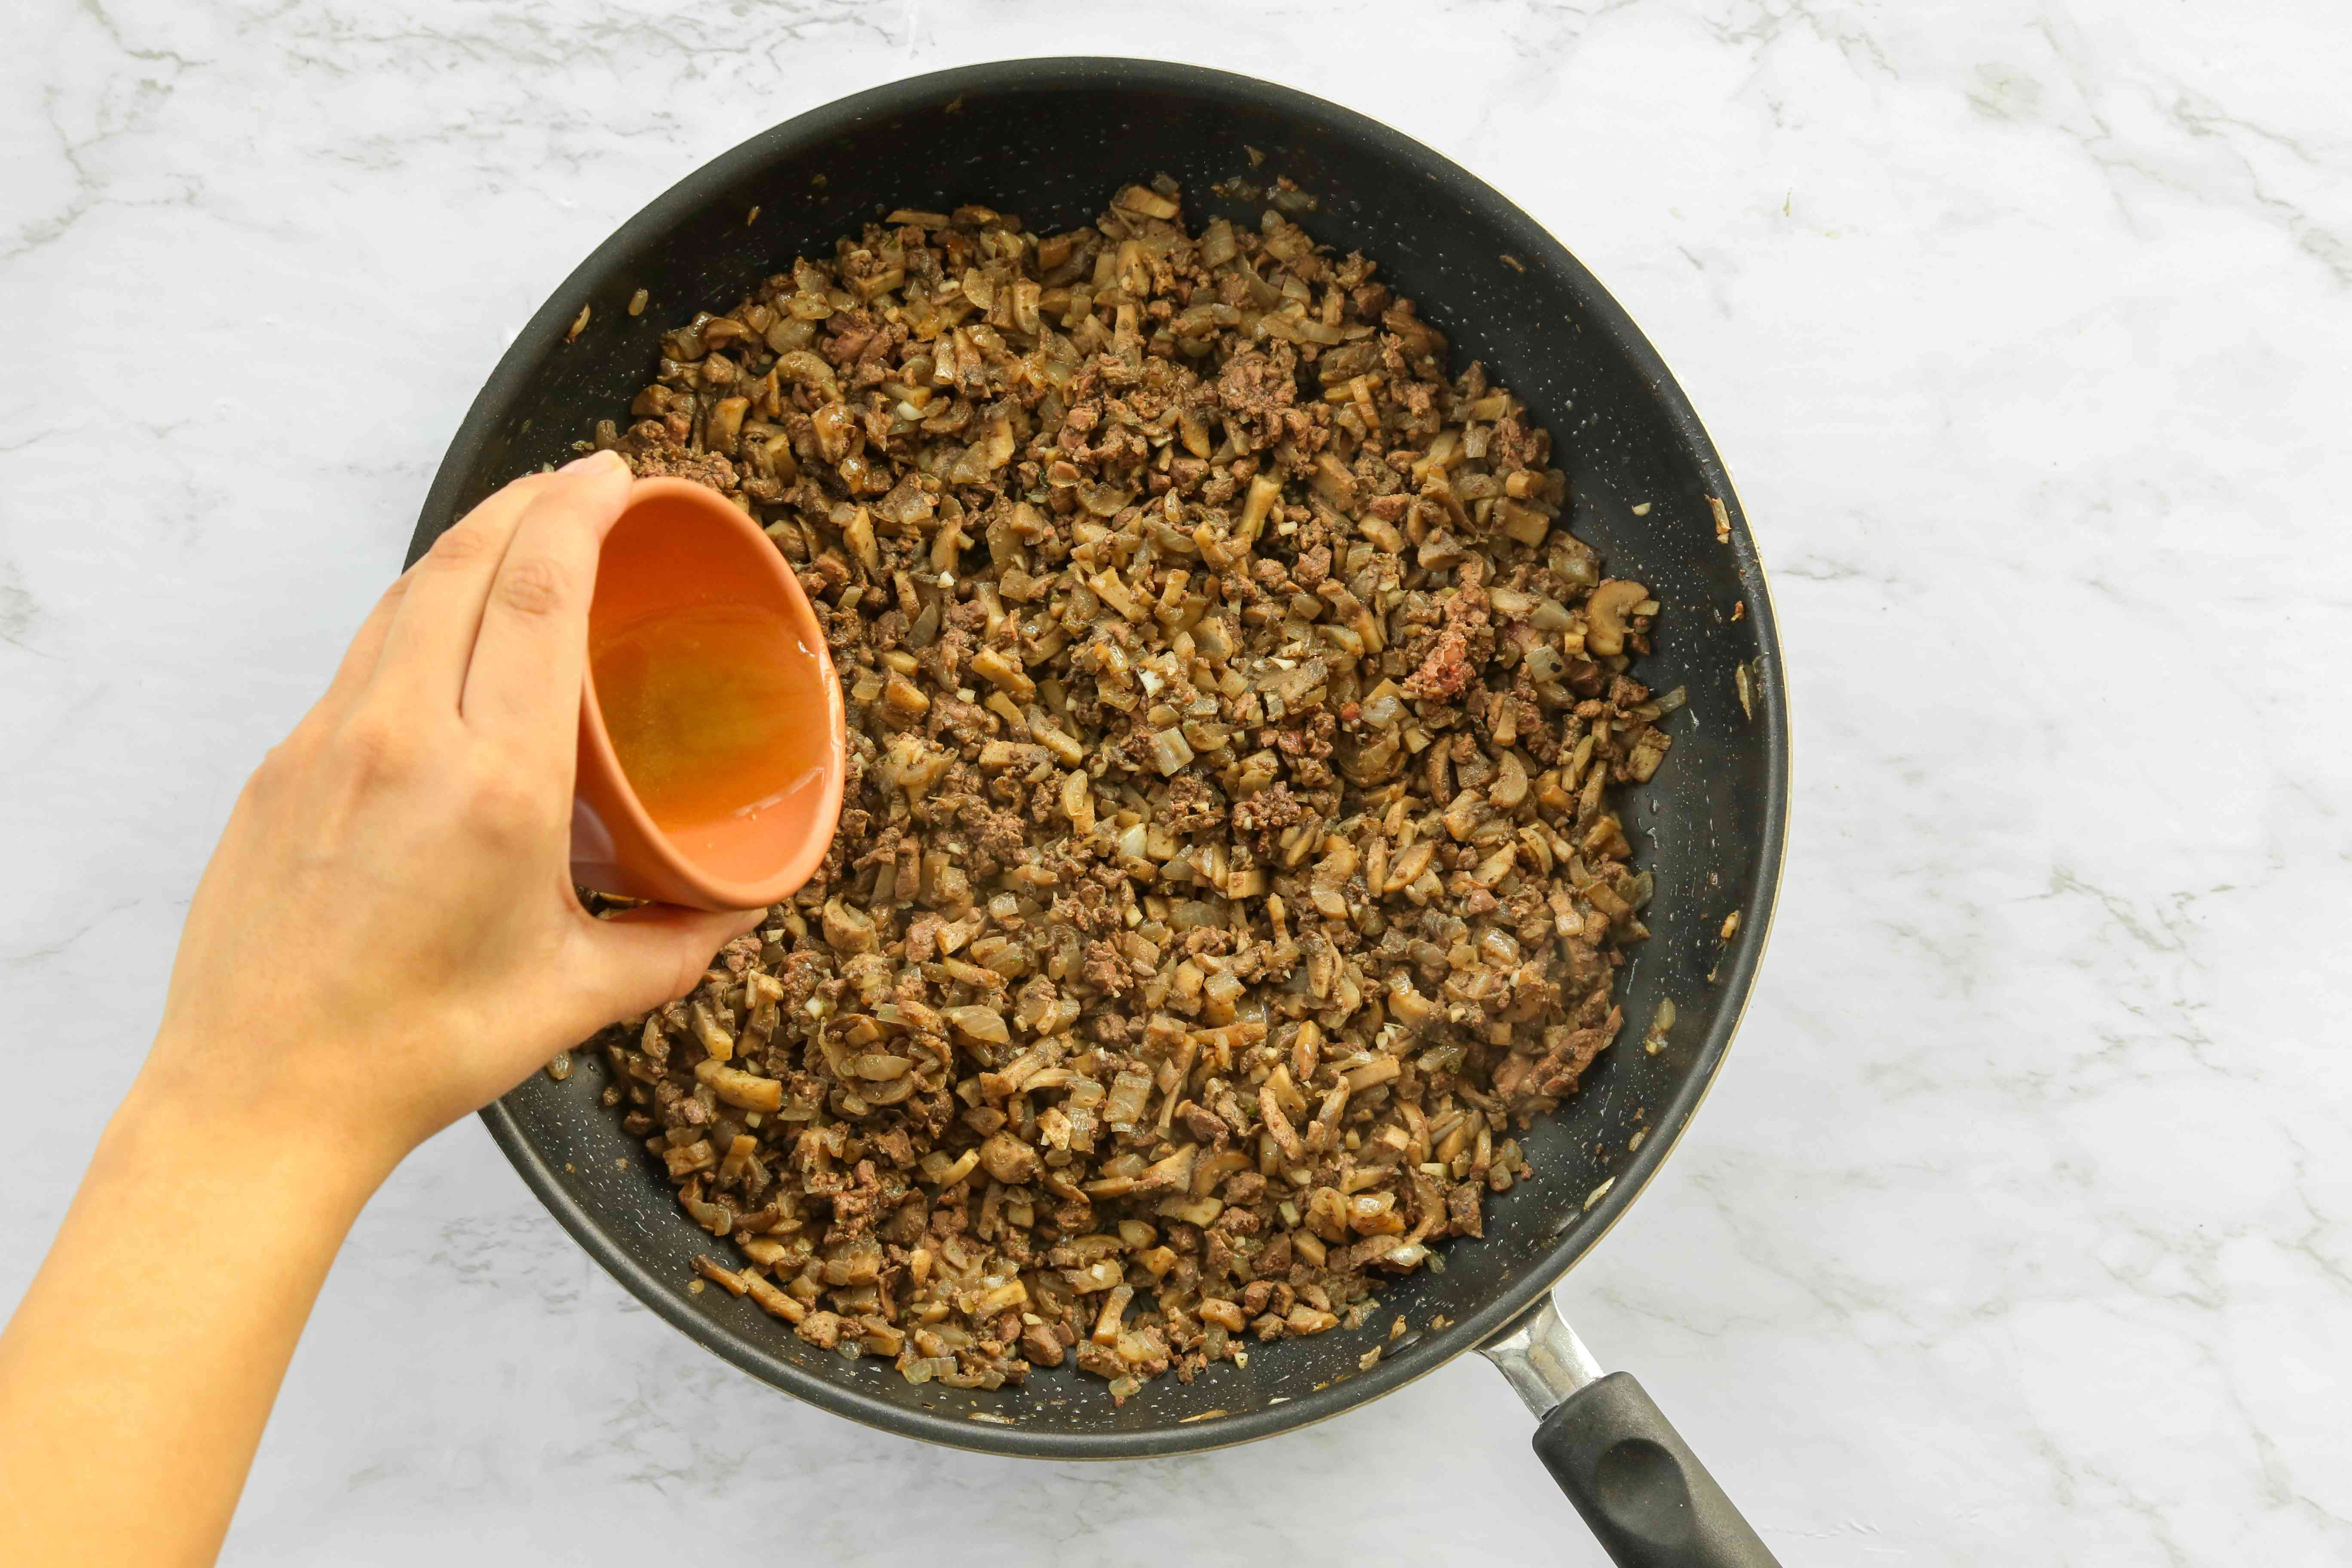 Add beef broth to the mushroom mixture